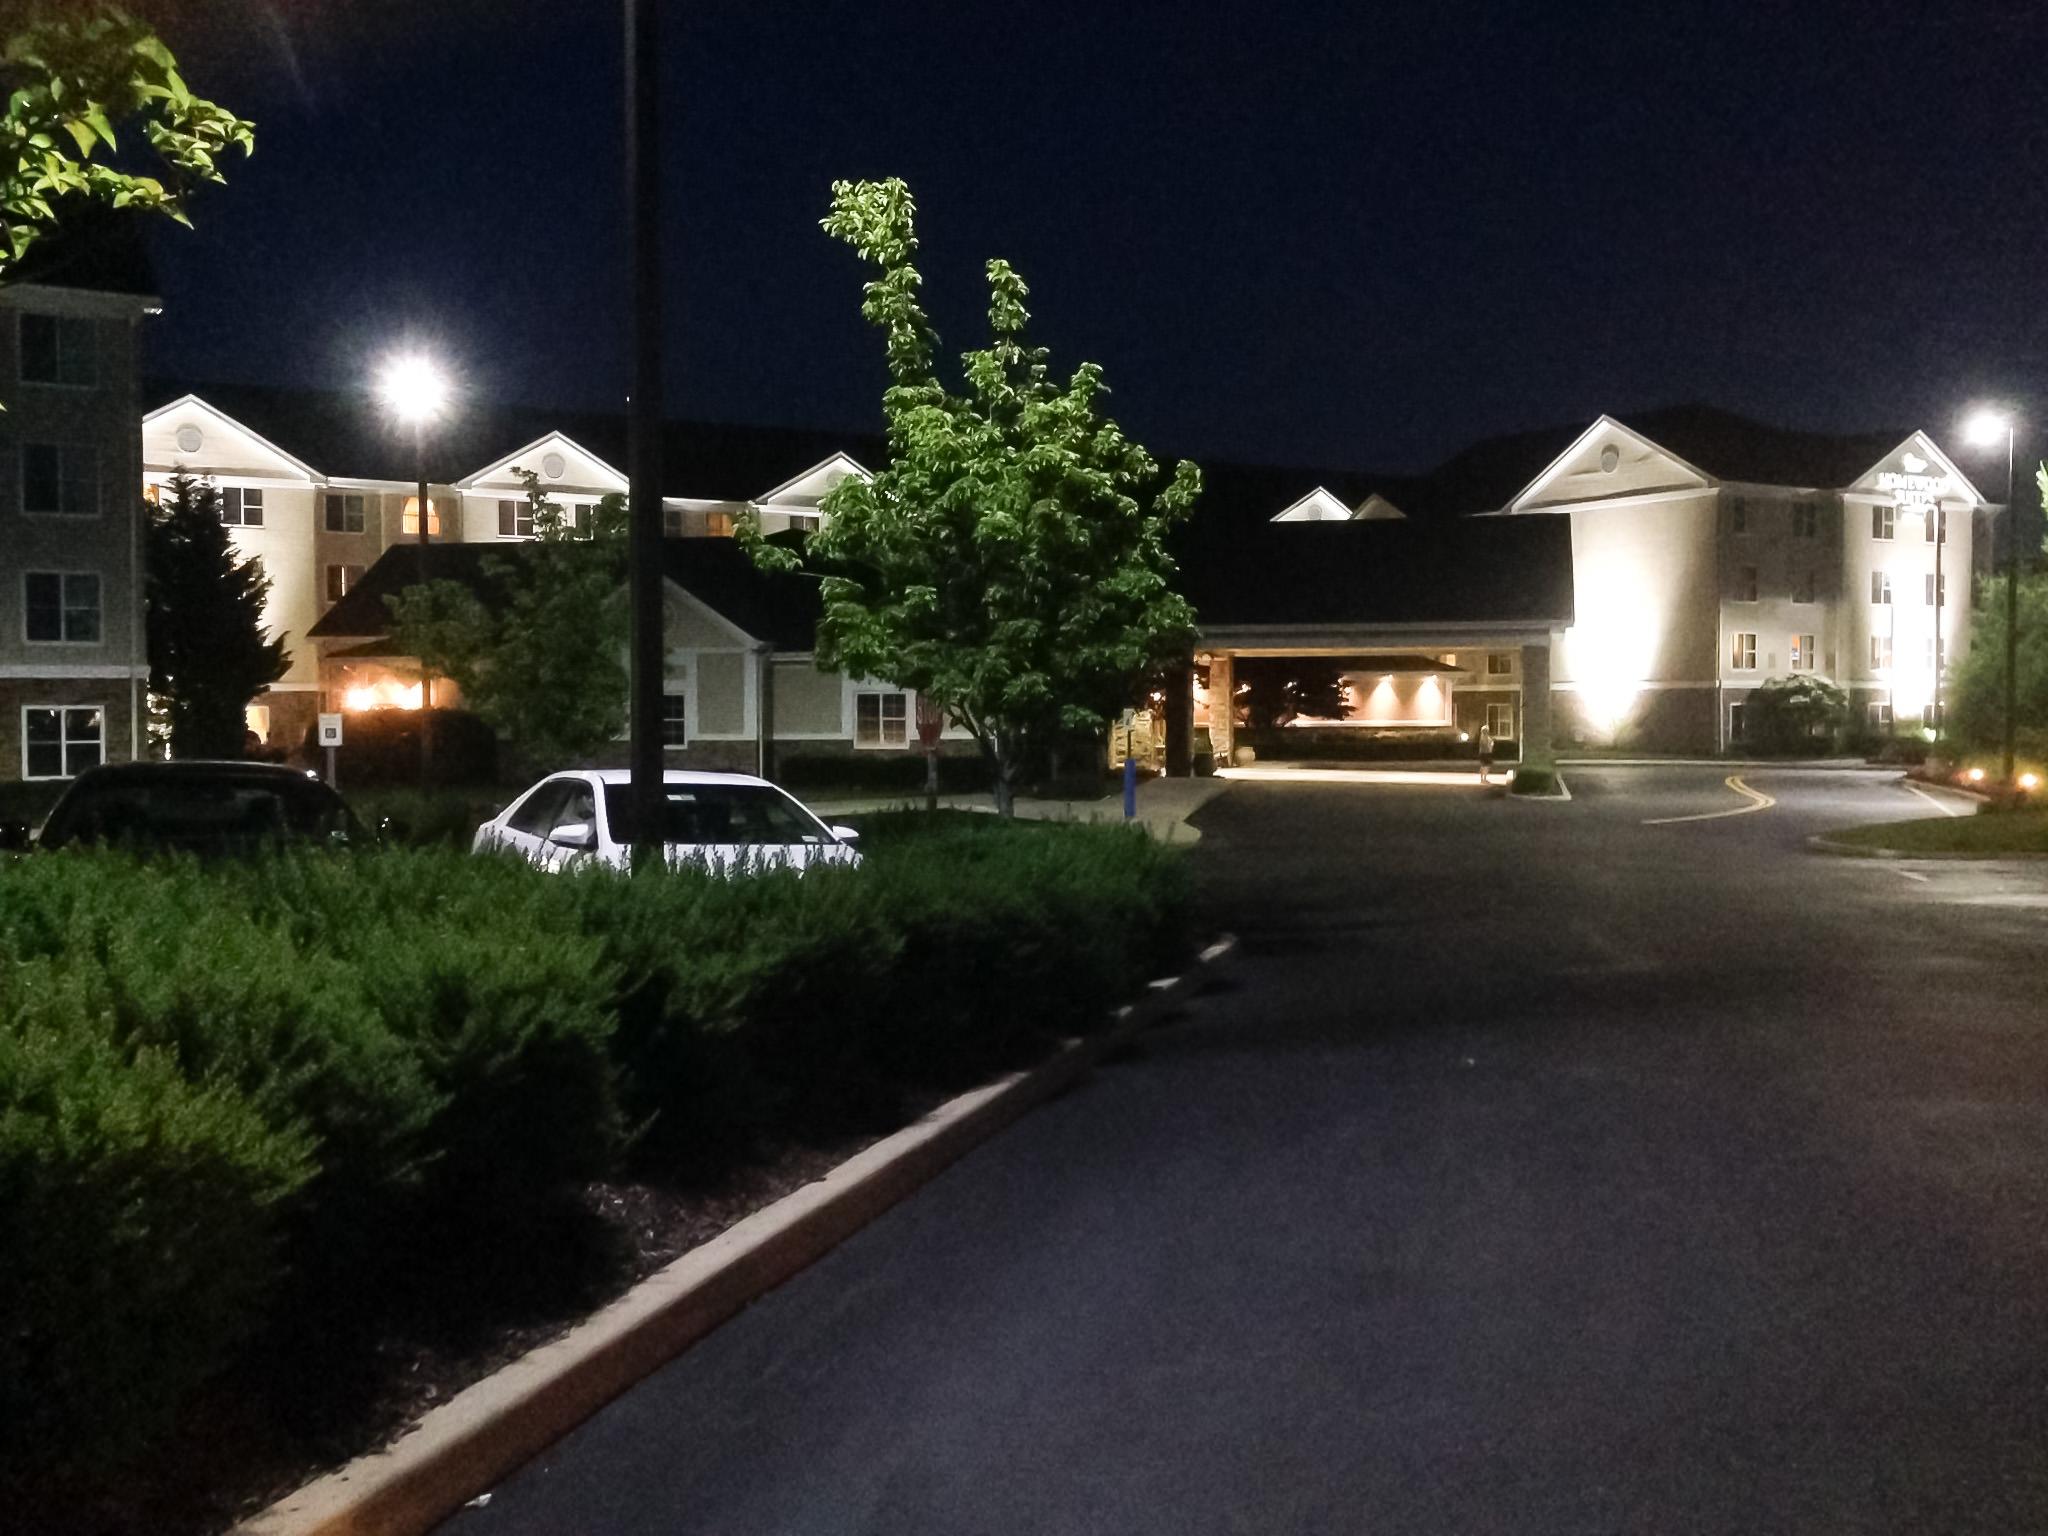 Hilton Homewood Suites ComPower LED 2-6.jpg